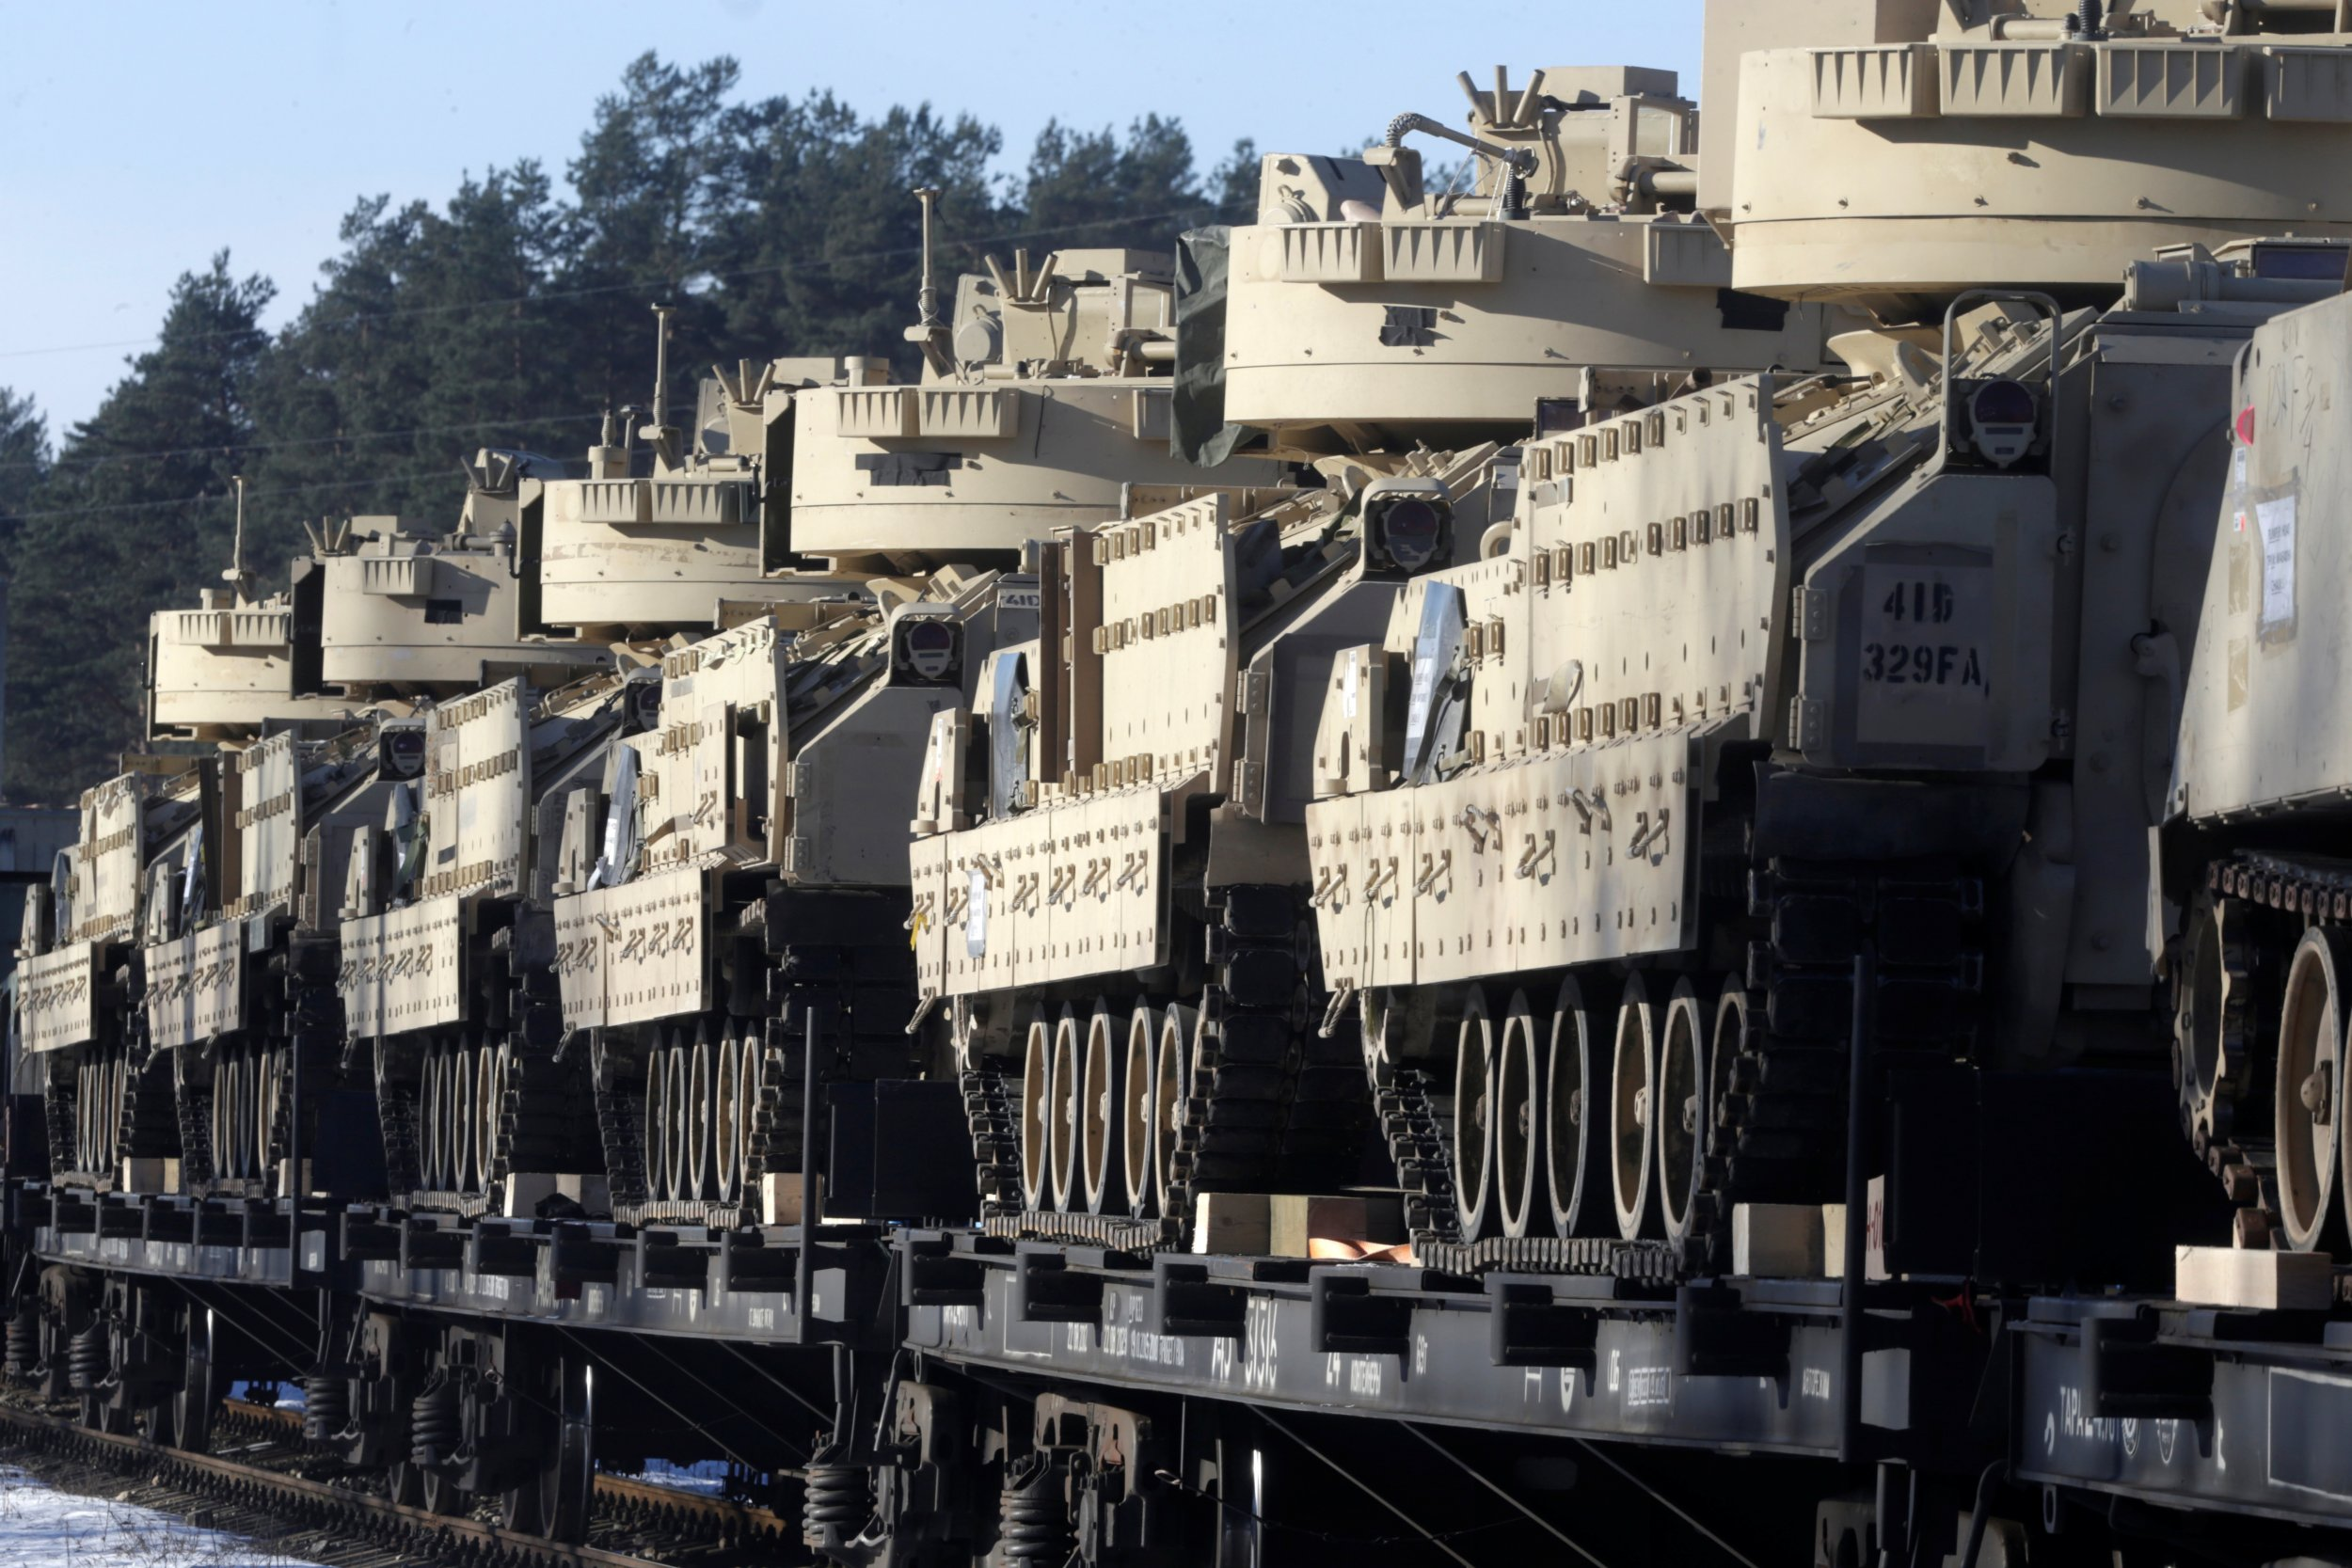 U.S. Bradley vehicles